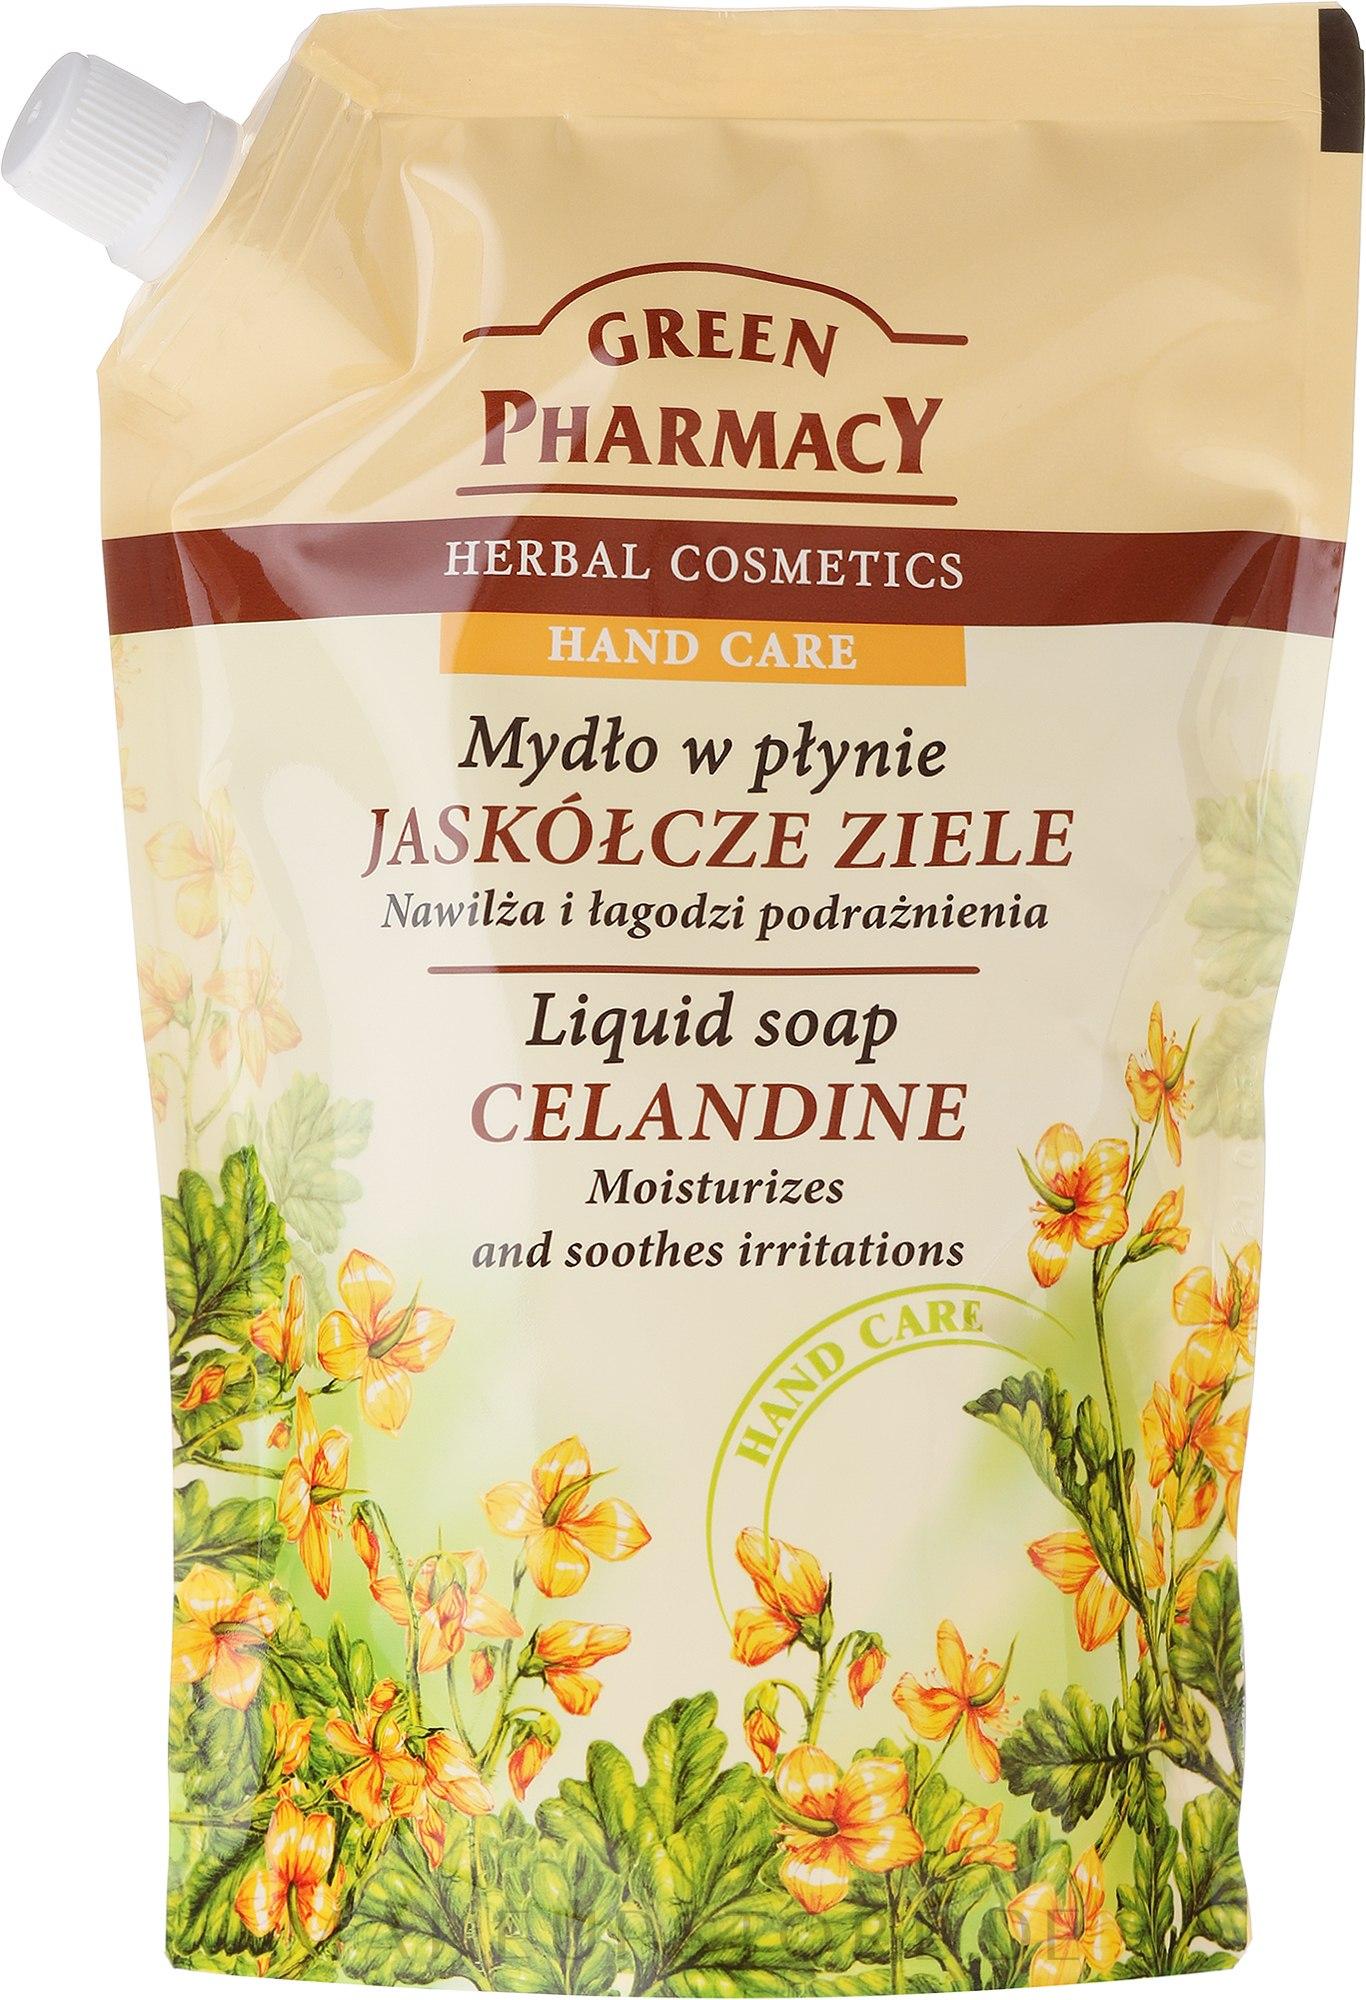 Flüssige Handseife mit Schöllkraut - Green Pharmacy Celandine Liquid Soap (Doypack) — Bild 465 ml